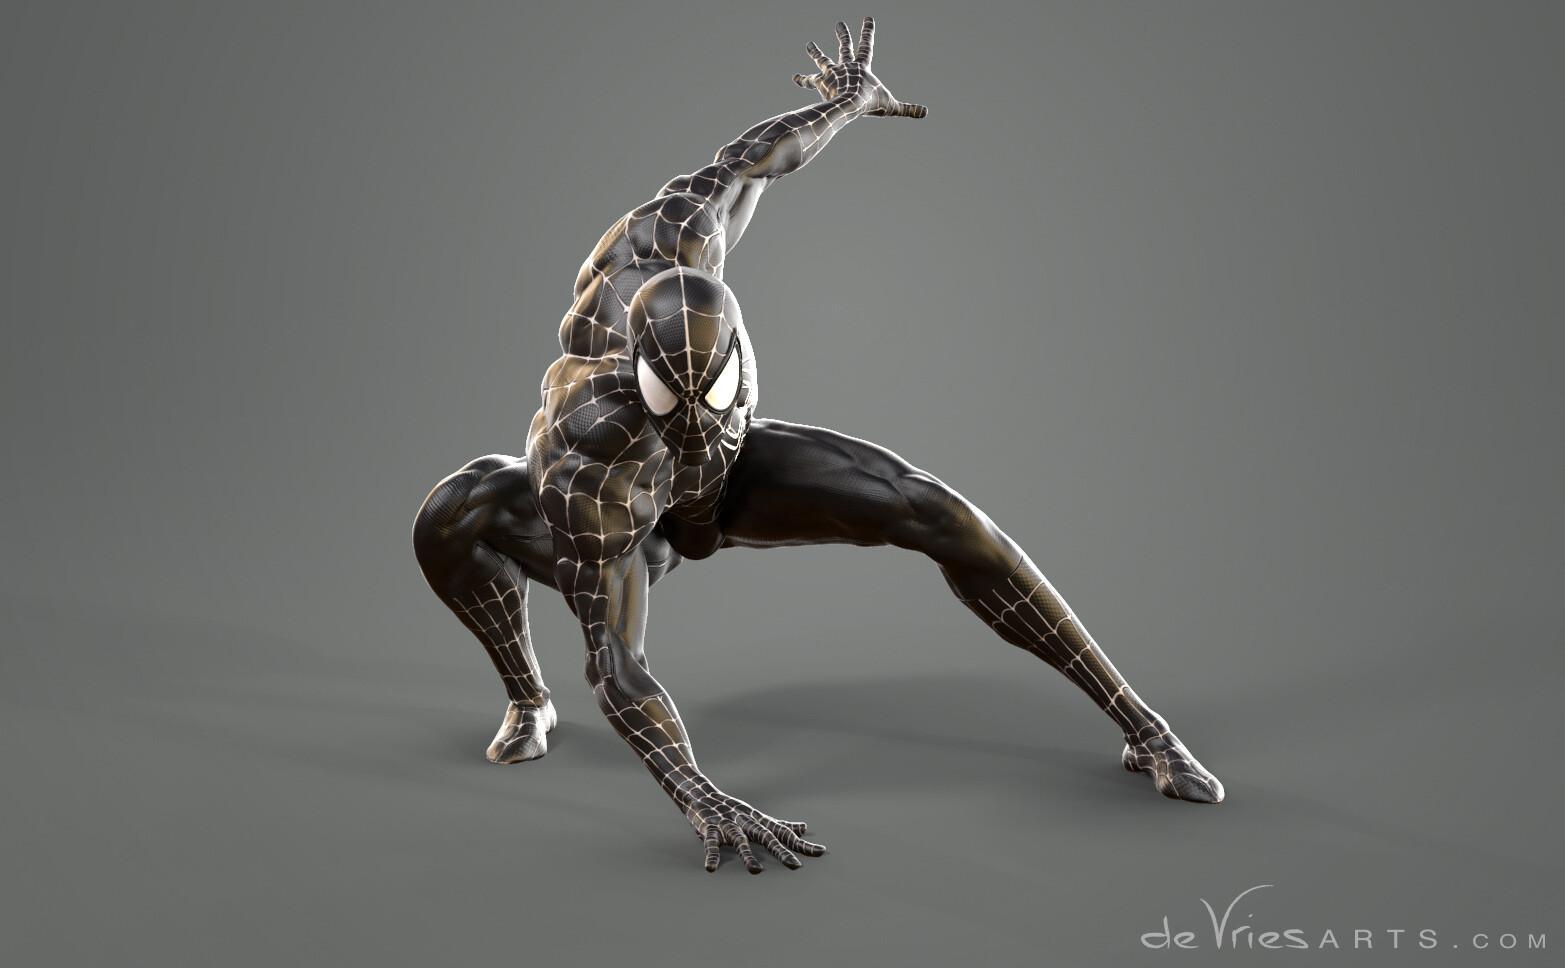 Thijs de vries crawling spiderman thijsdevries devriesarts